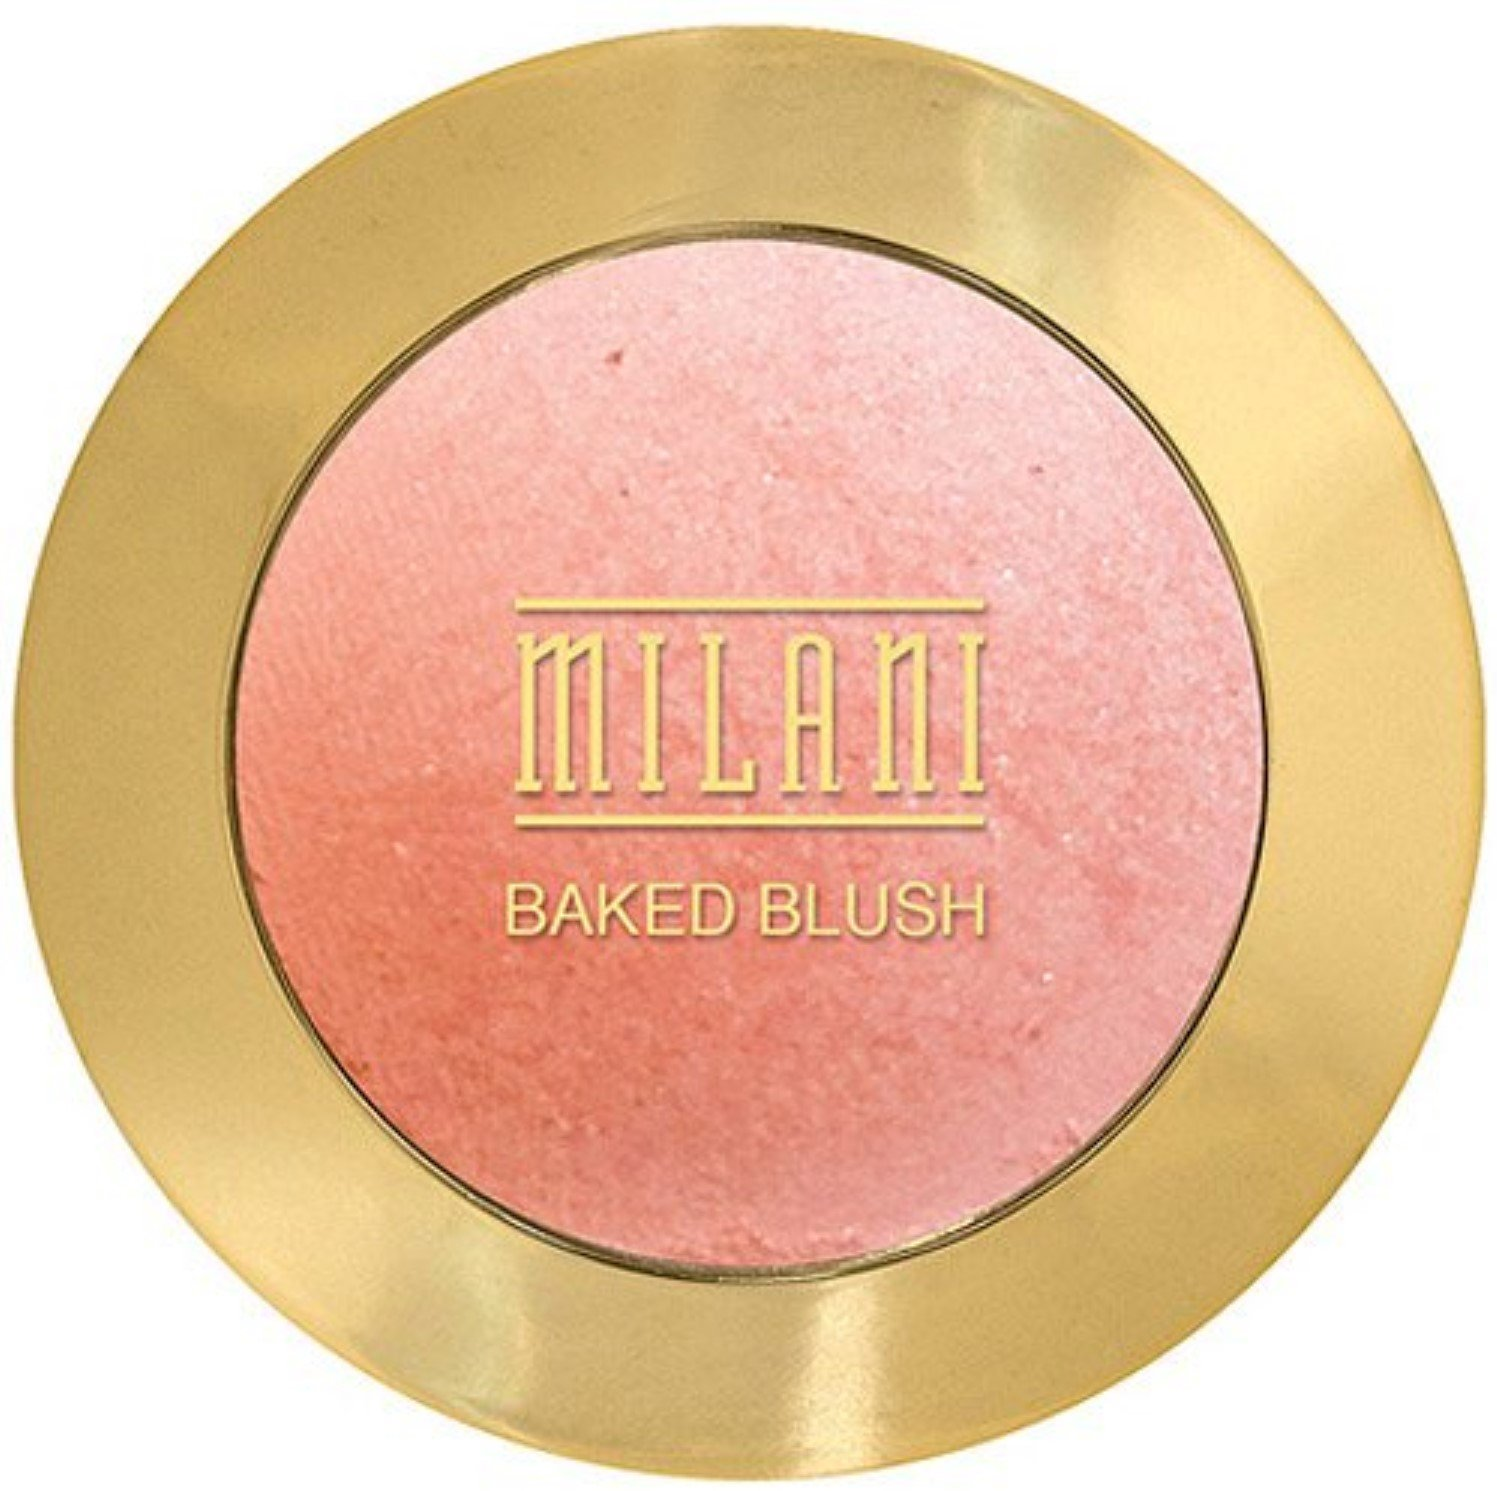 Image result for luminoso blush